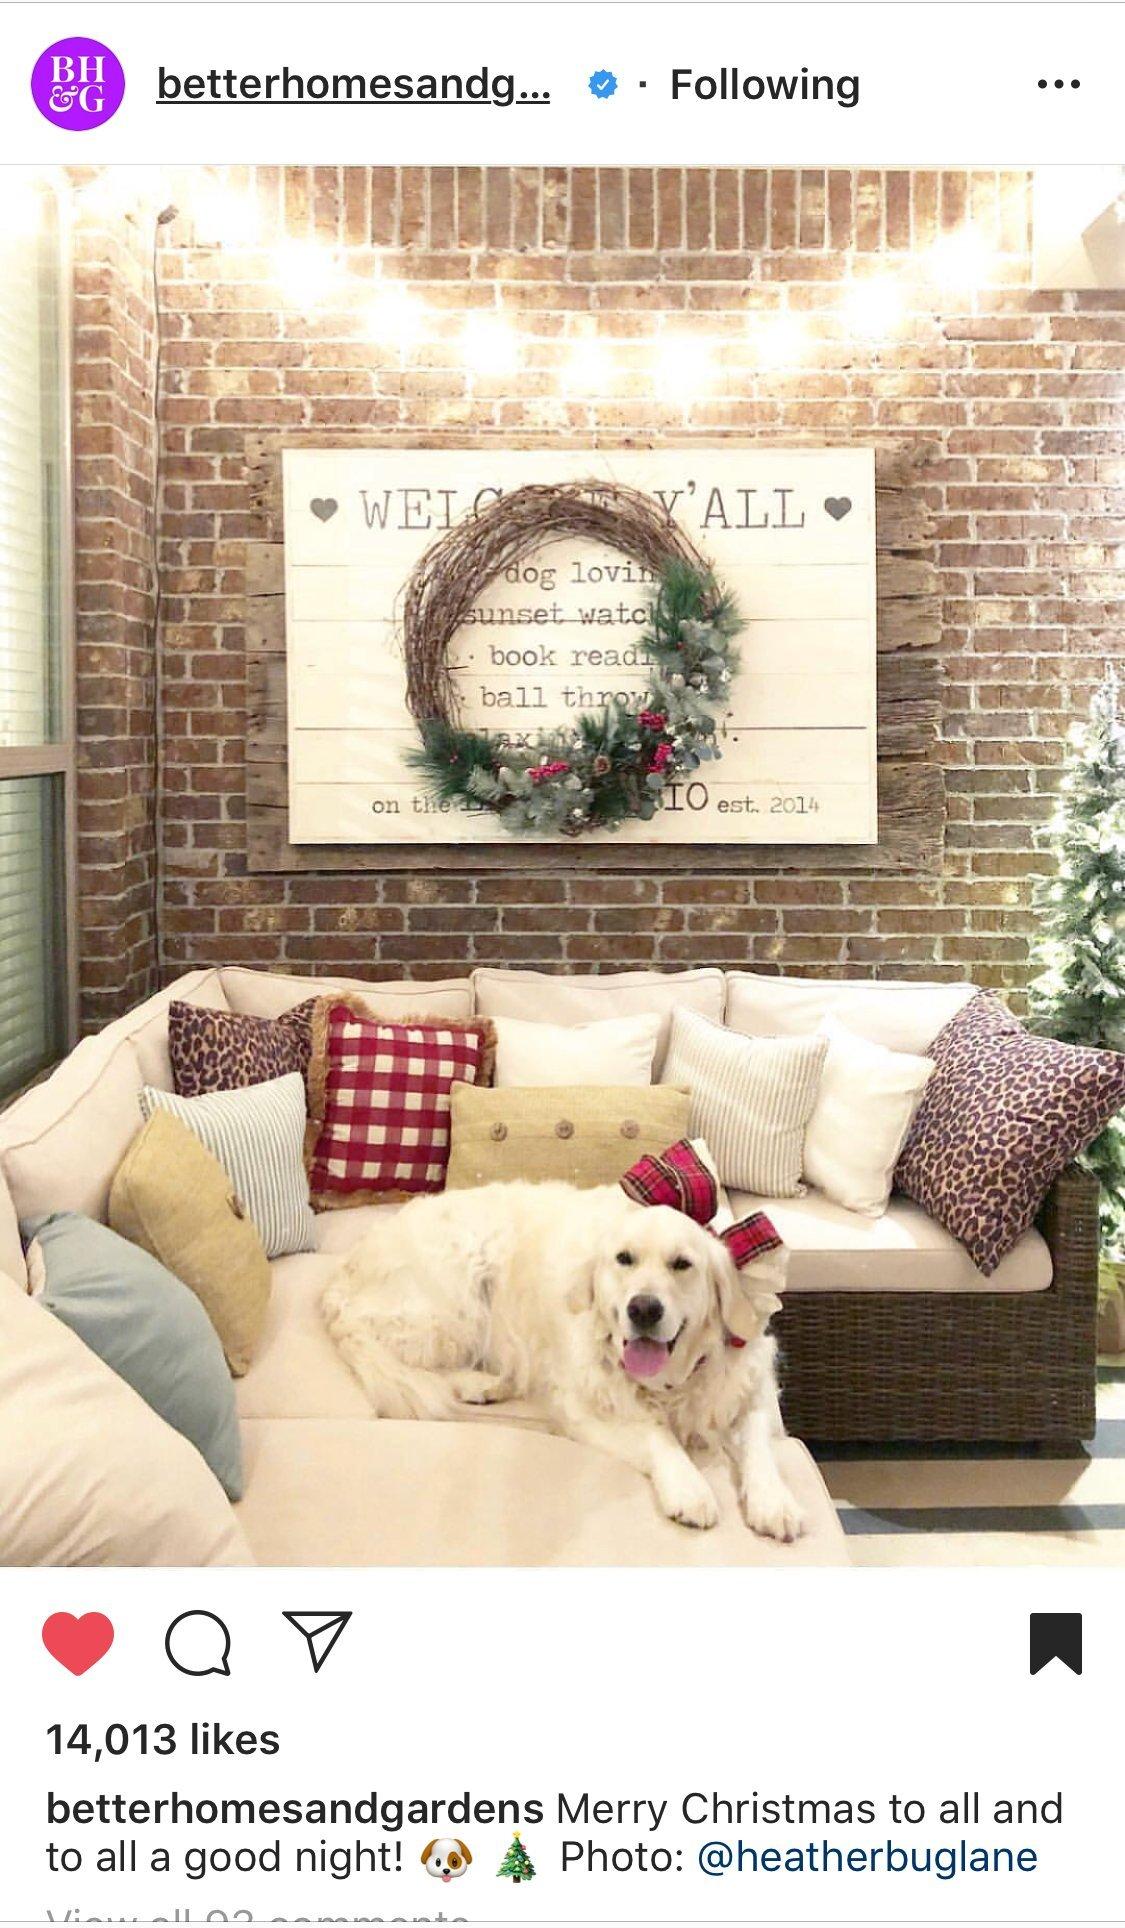 english cream golden retriever puppies, happy families, wisteria goldens, moses honor thor